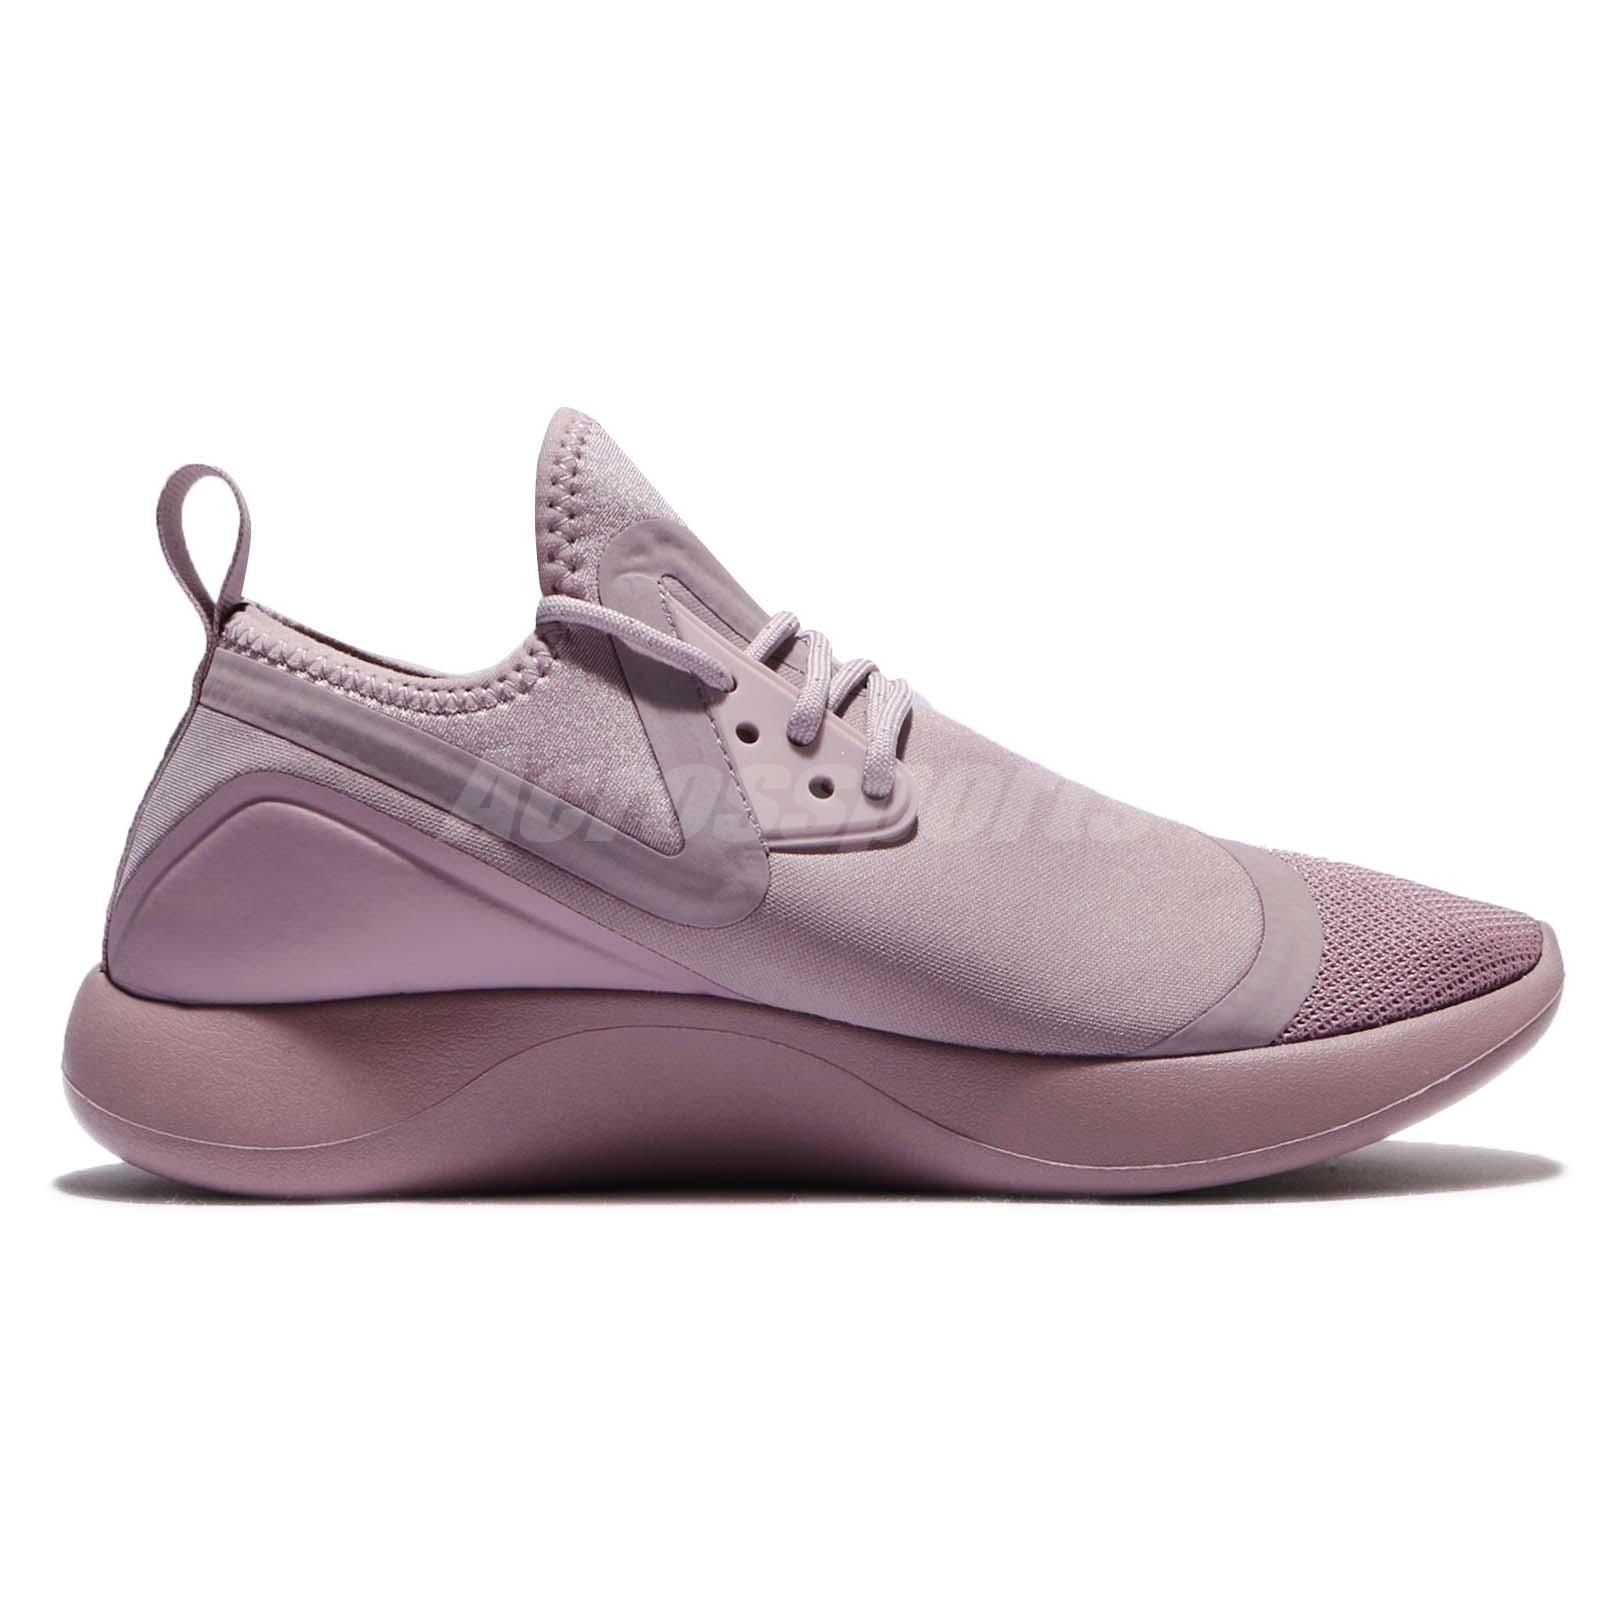 b8449f3a5e Nike Wmns Lunarcharge Essential Plum Fog Purple Women Running Shoes ...